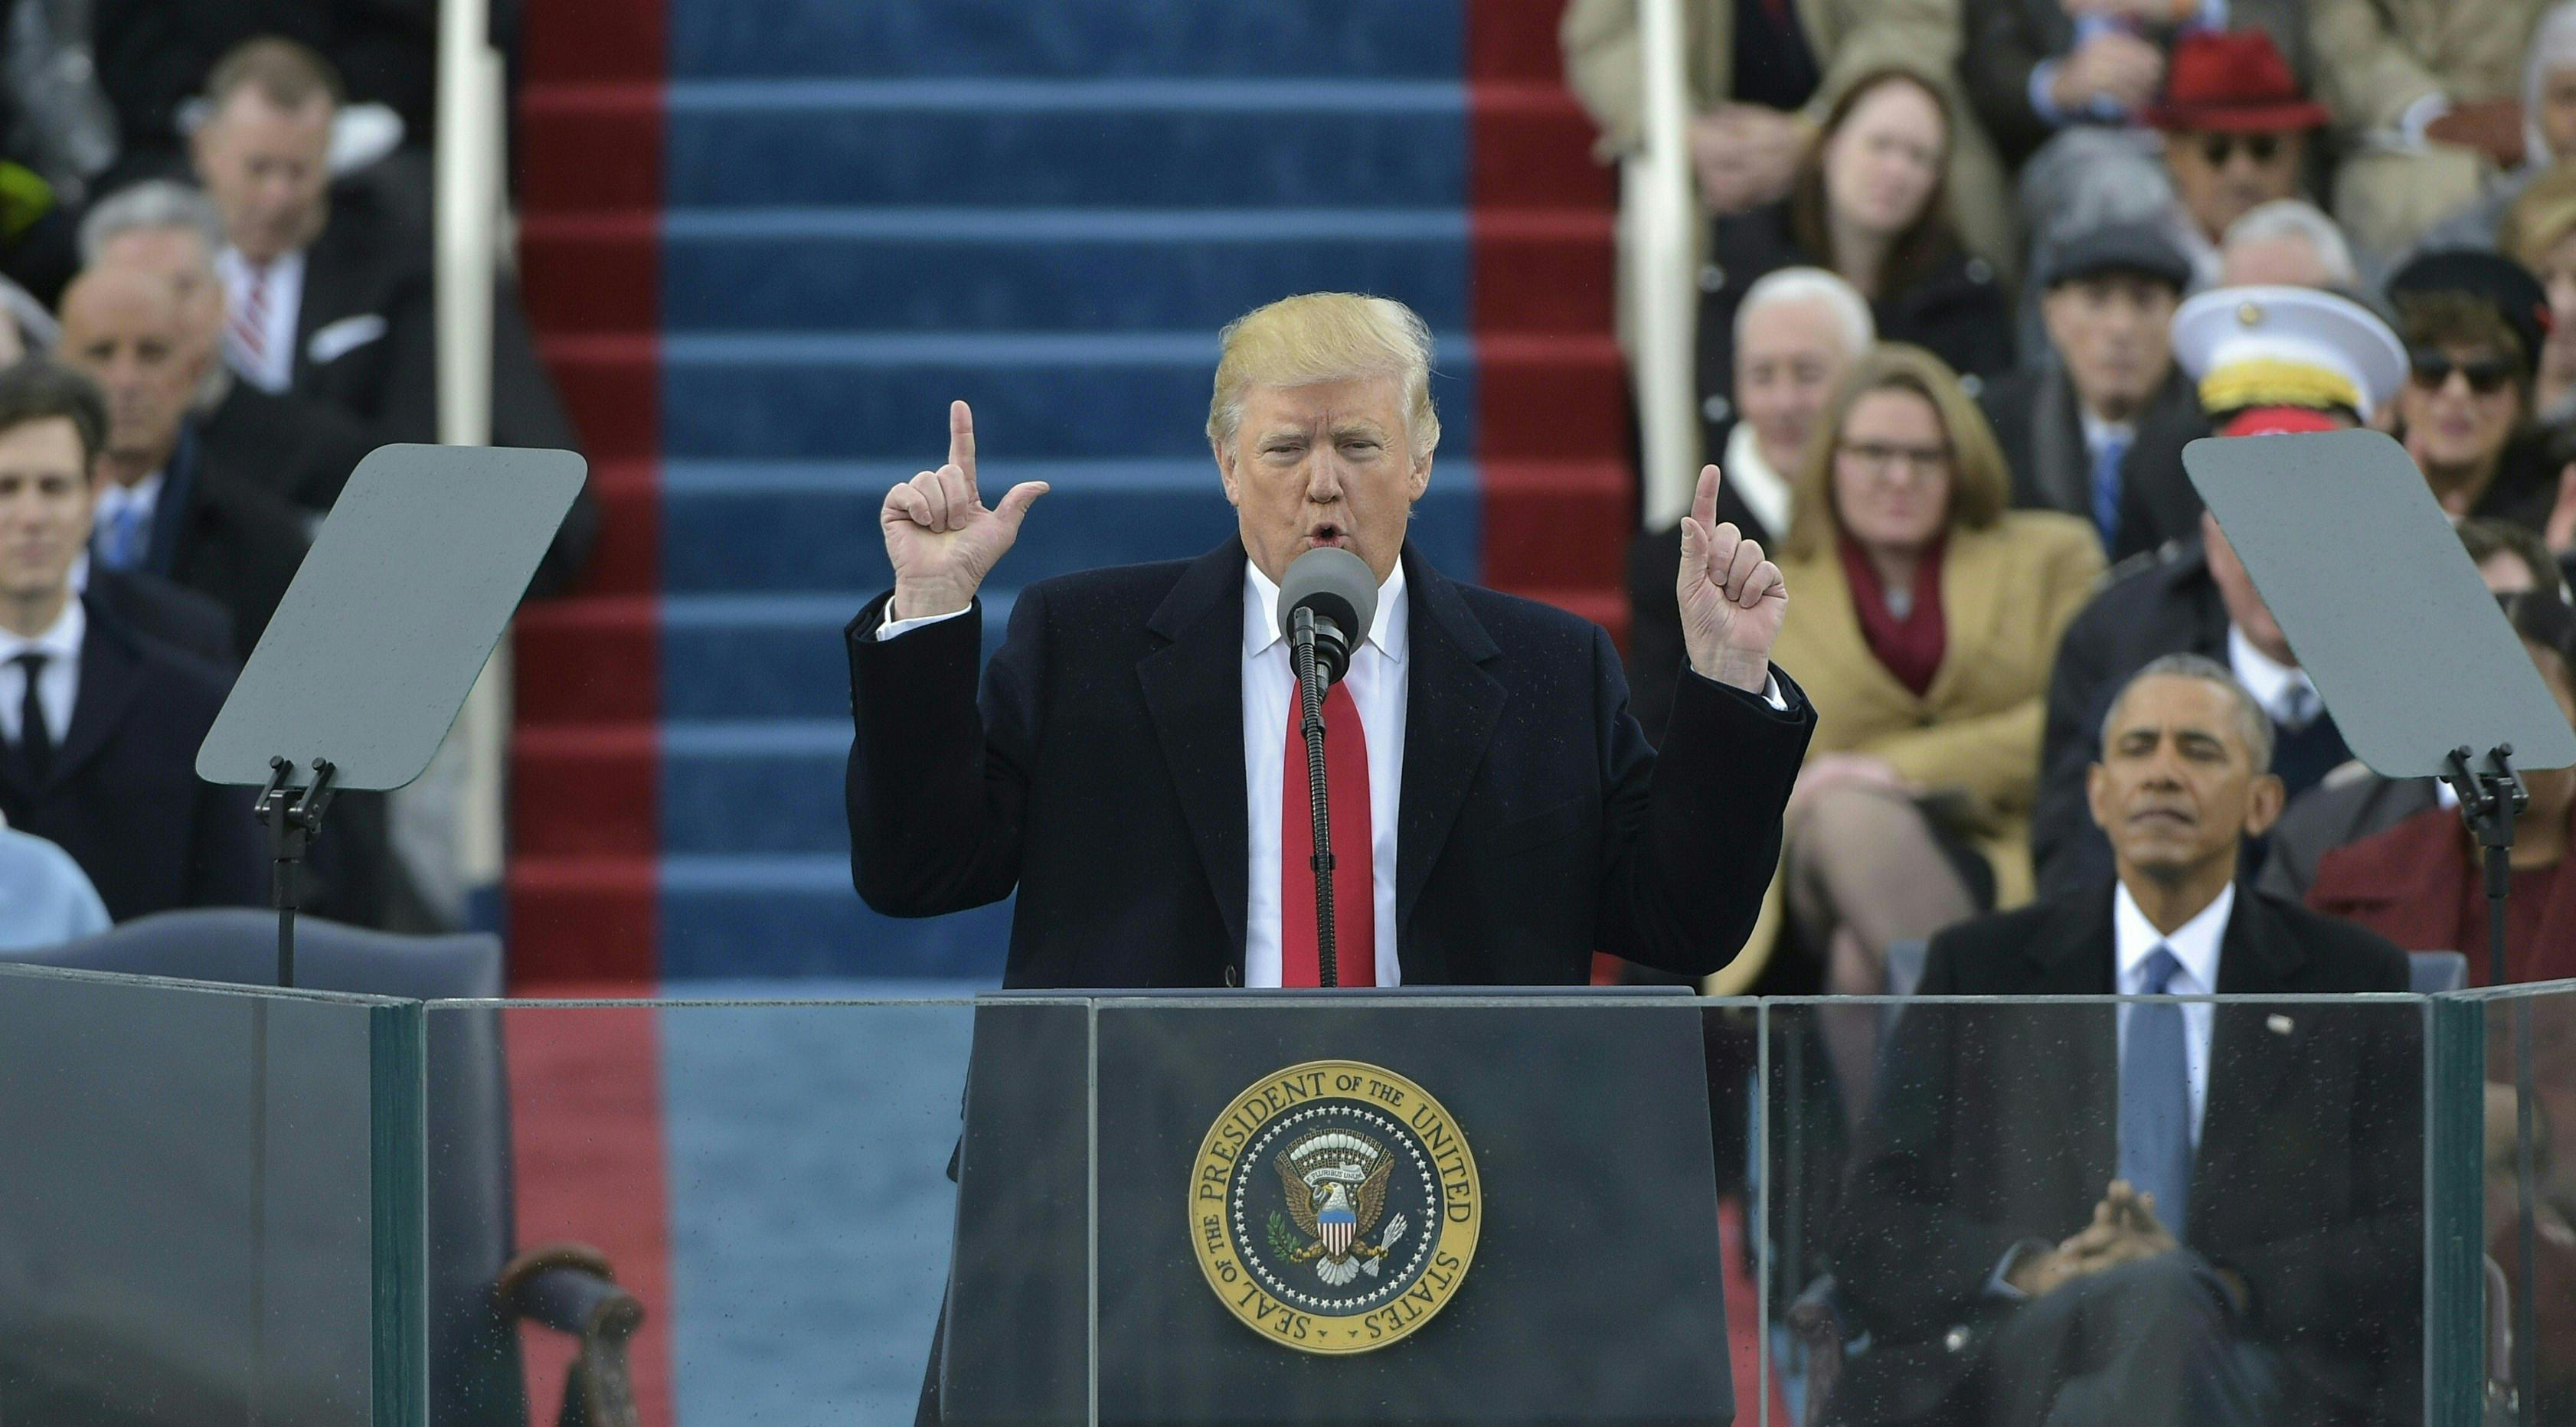 Donald Trump mendapat tempat untuk memberi pidato perdana sebagai Presiden AS di Capitol Hill, Washington DC, AS, Jumat (20/1). Dalam pidatonya, Trump meyakinkan warga Amerika bahwa dirinya tidak akan mengecewakan warga Amerika. (AFP Photo)